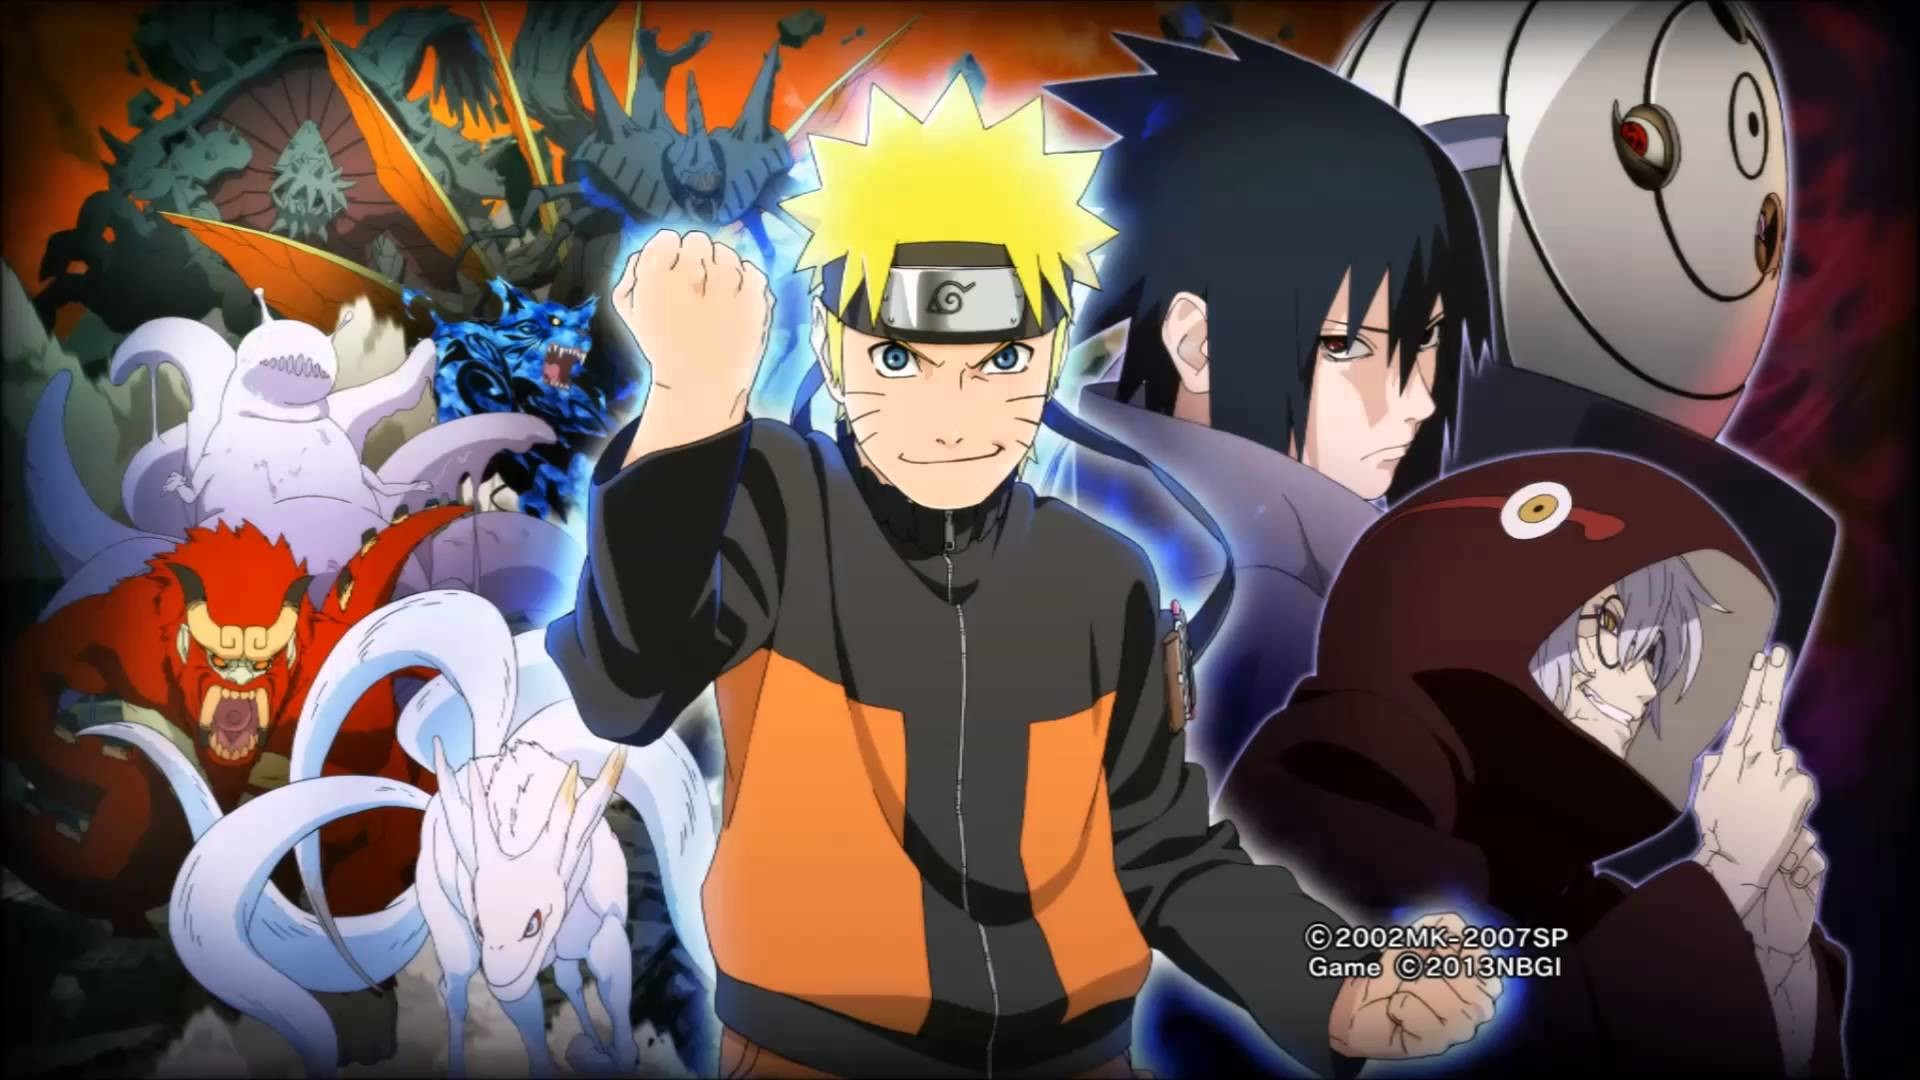 Simple Wallpaper Naruto Halloween - 714185-popular-naruto-shippuden-wallpaper-terbaru-2018-1920x1080-for-mobile-hd  Graphic_213484.jpg